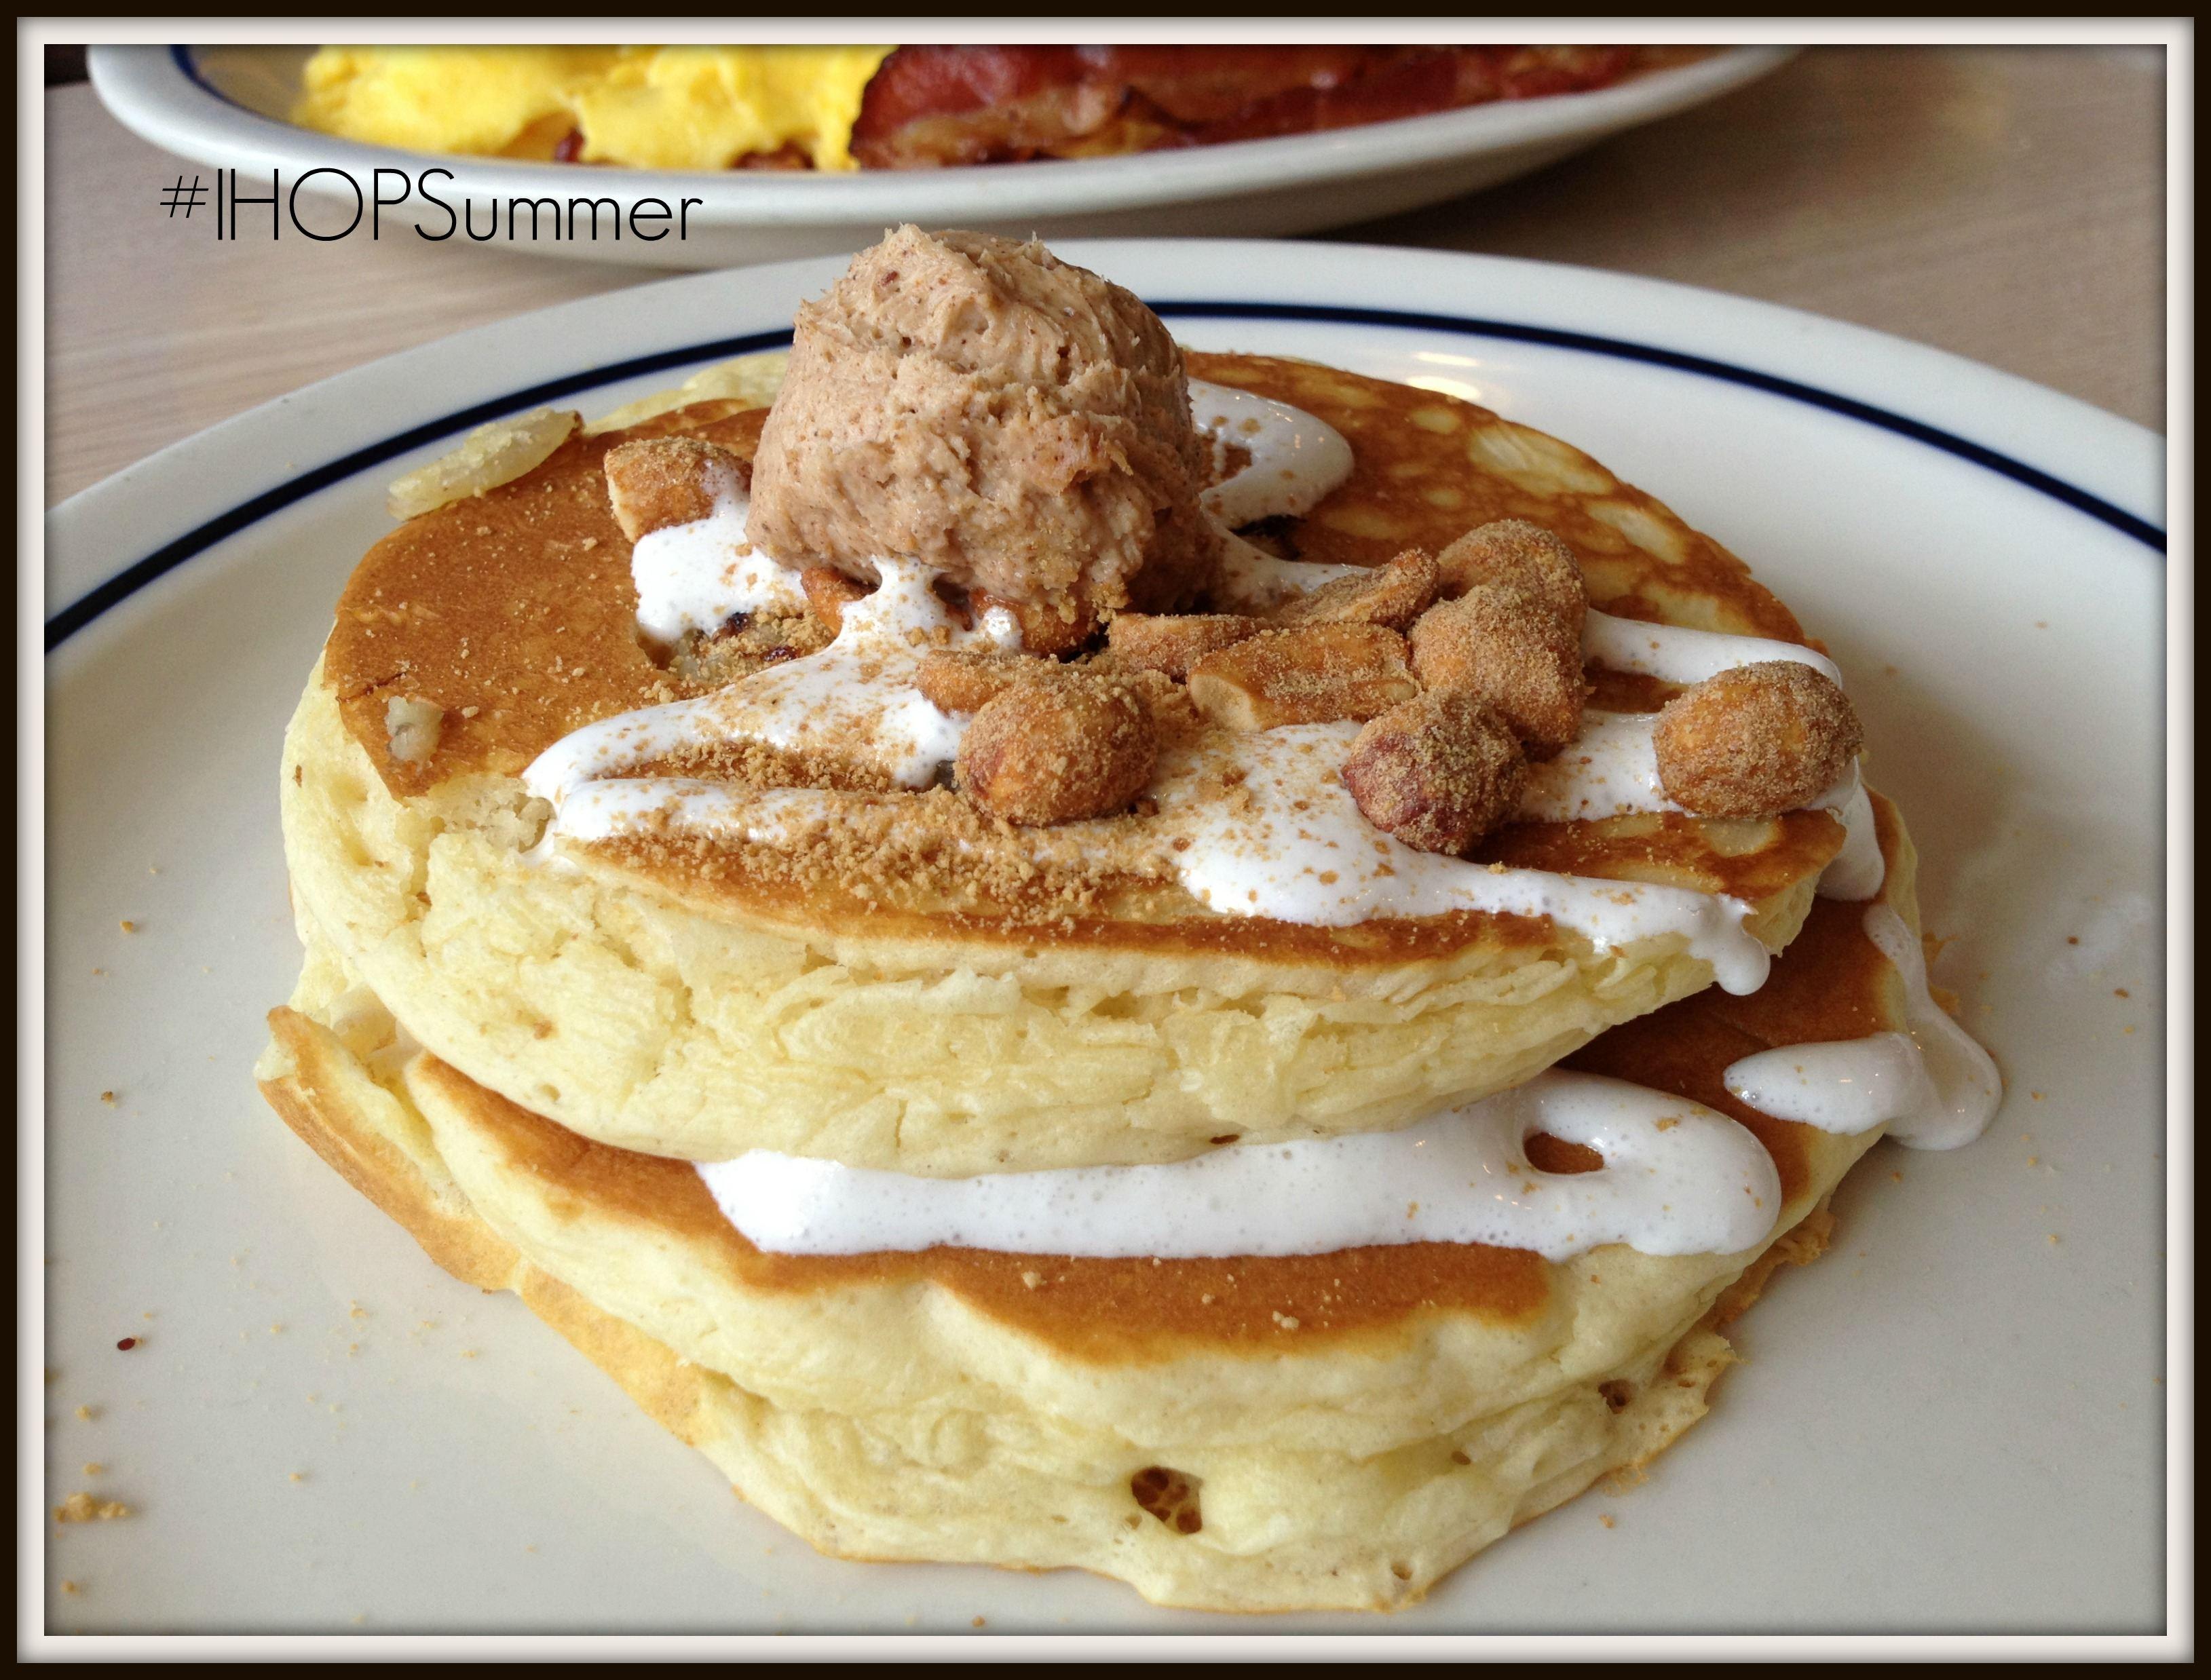 IHOP Adds Delicious Summer Pancakes to the Menu #IHOPSummer ...